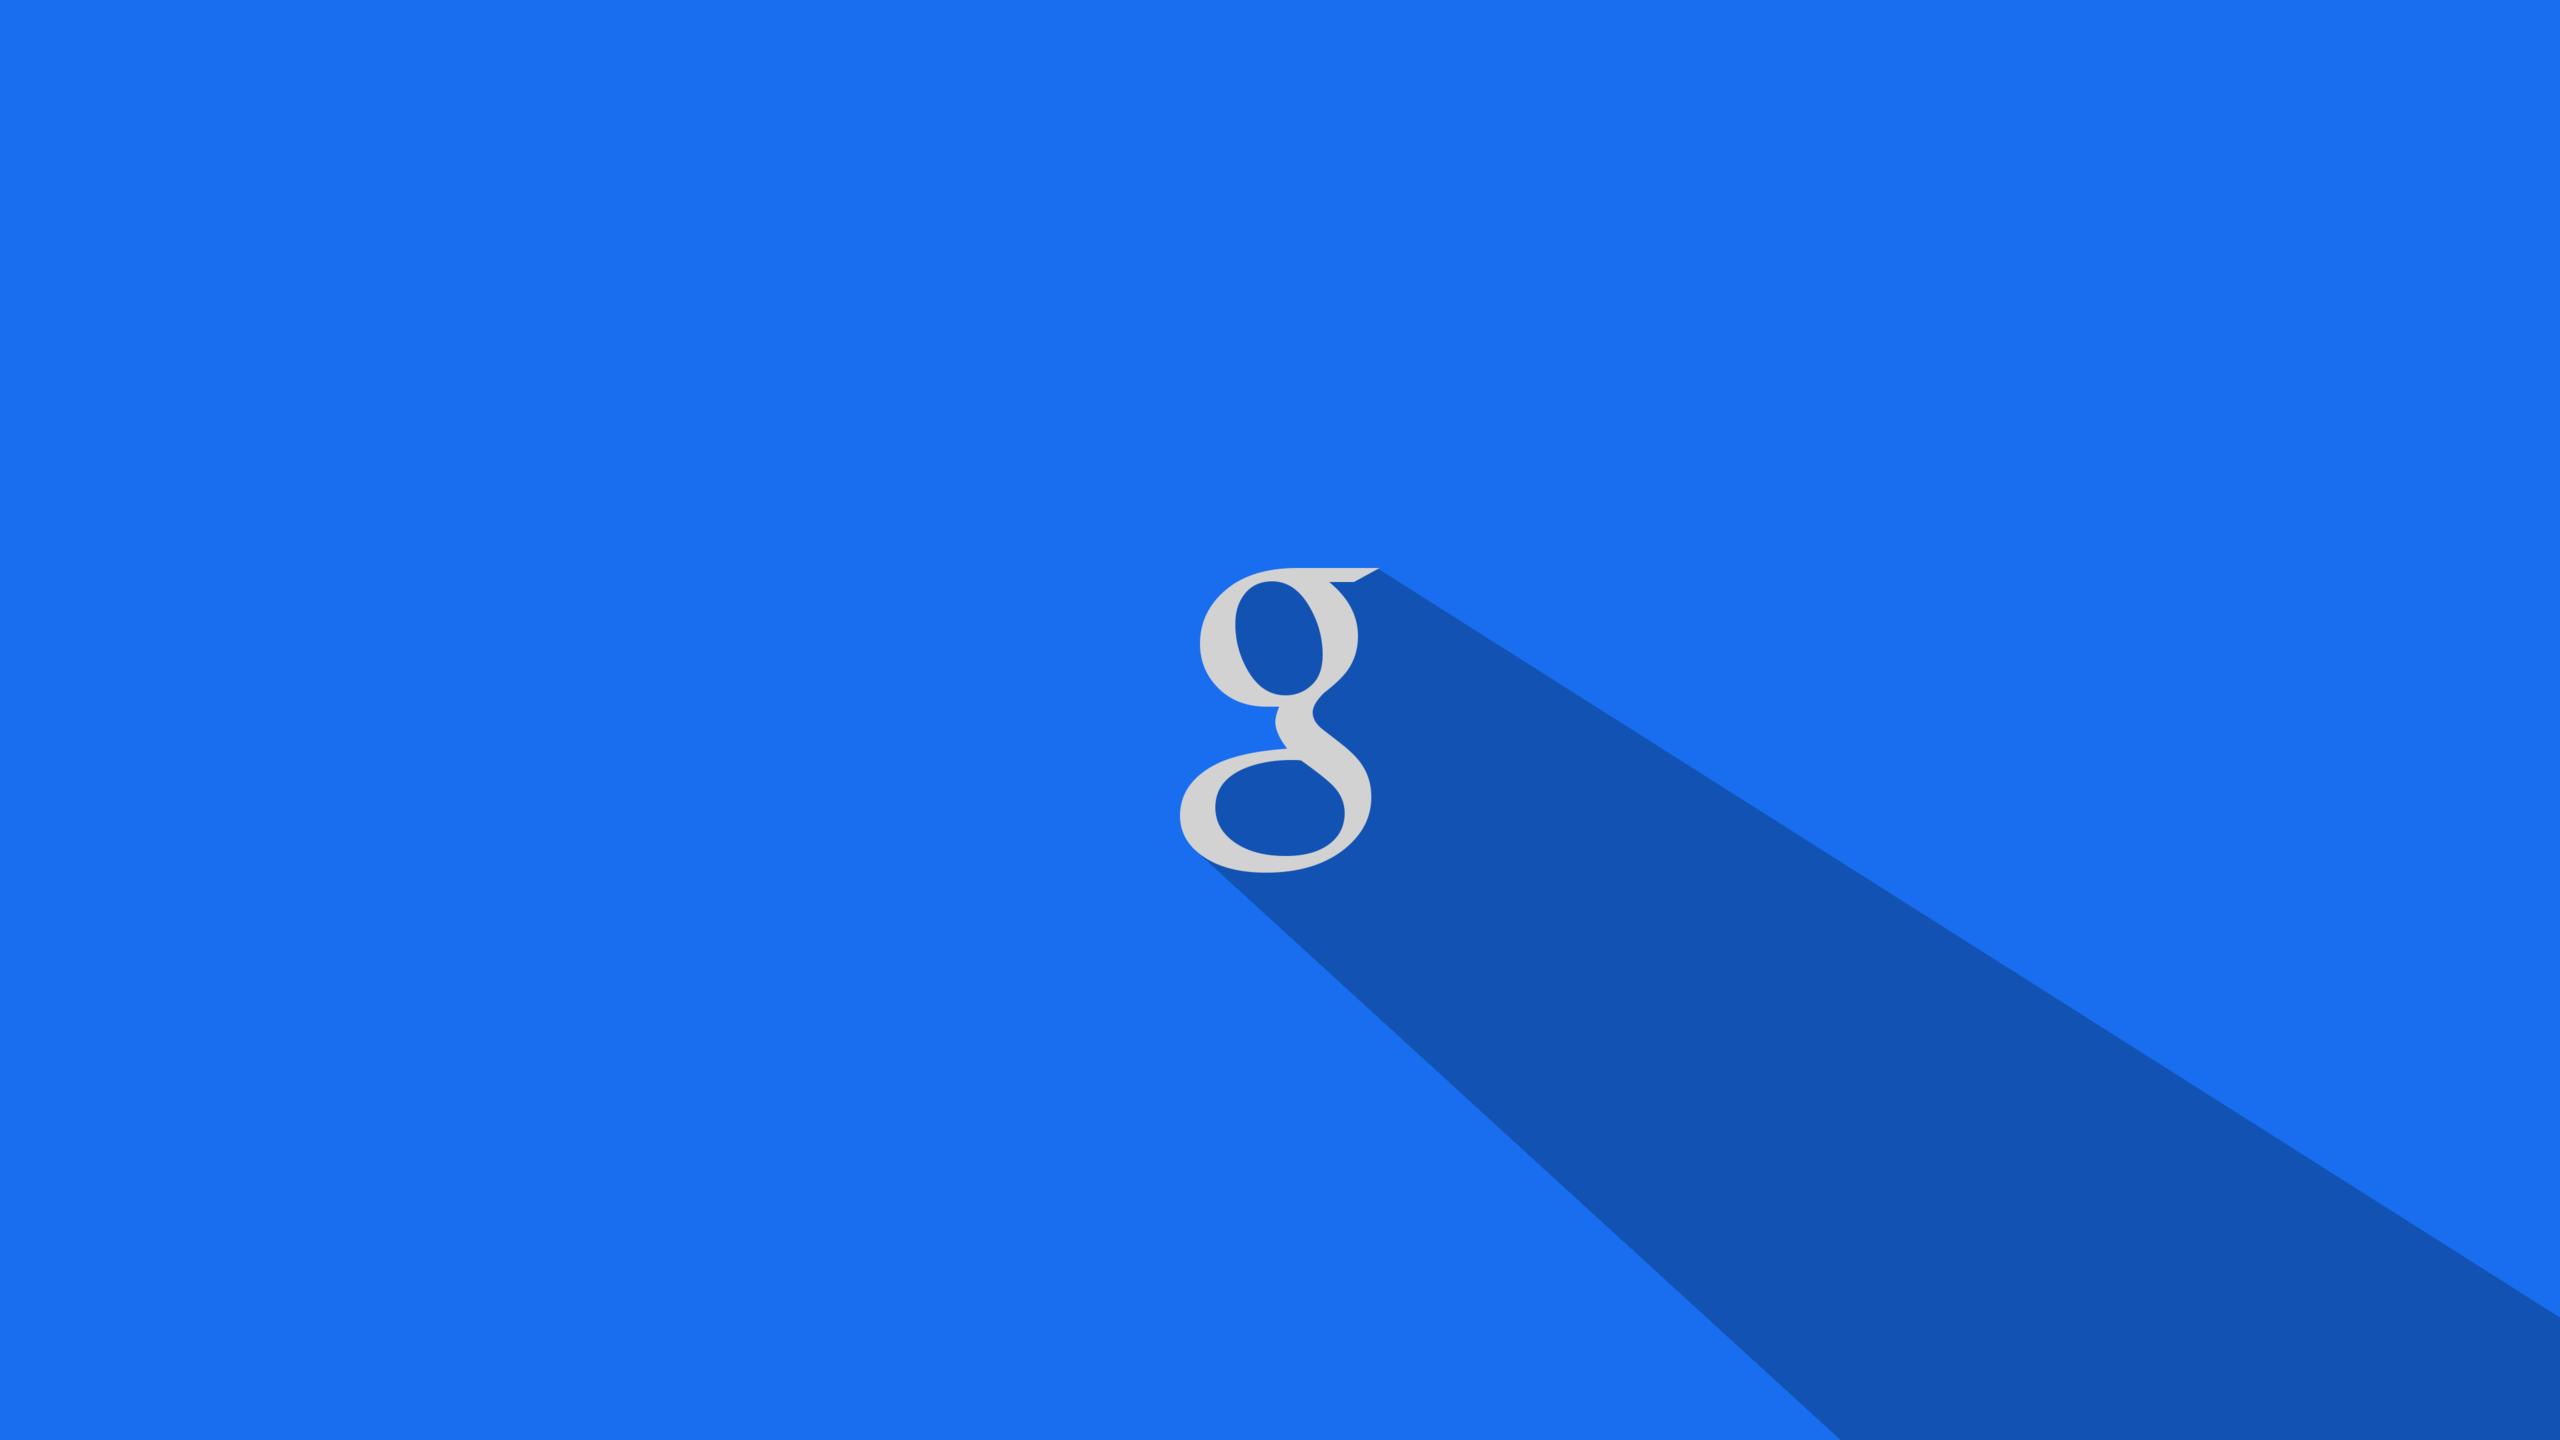 Google Wallpaper 24147 2560x1440